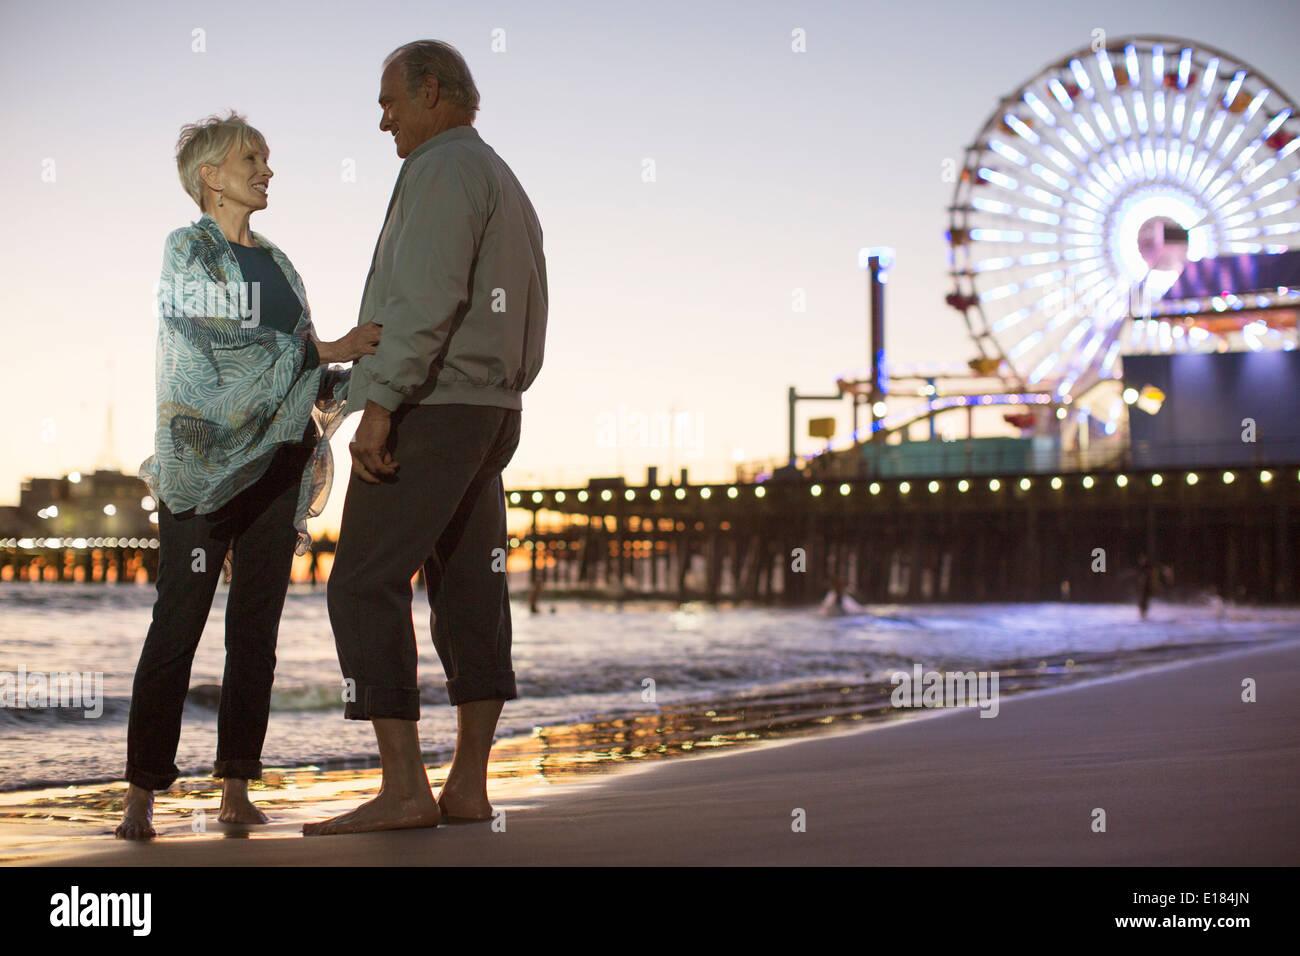 Senior couple on beach at night - Stock Image